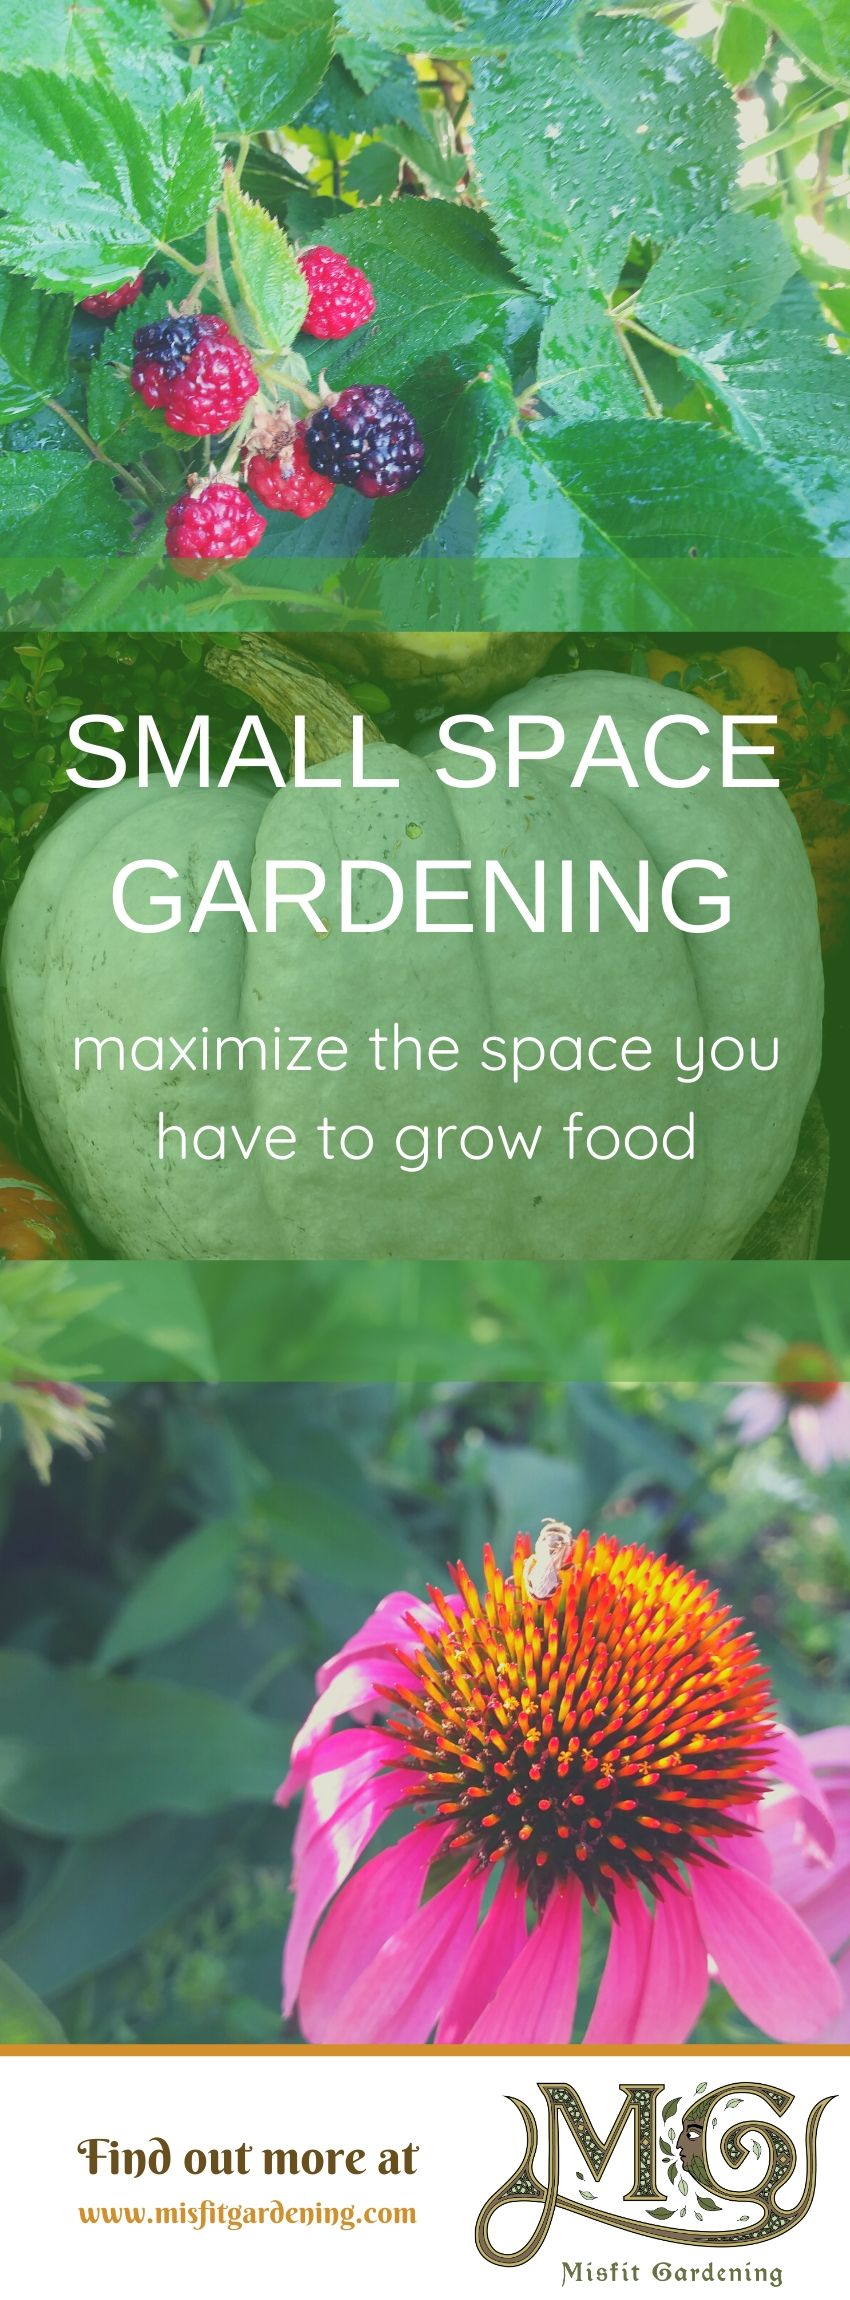 Small Space Gardening Misfit Gardening,Home Office Furniture Arrangement Ideas